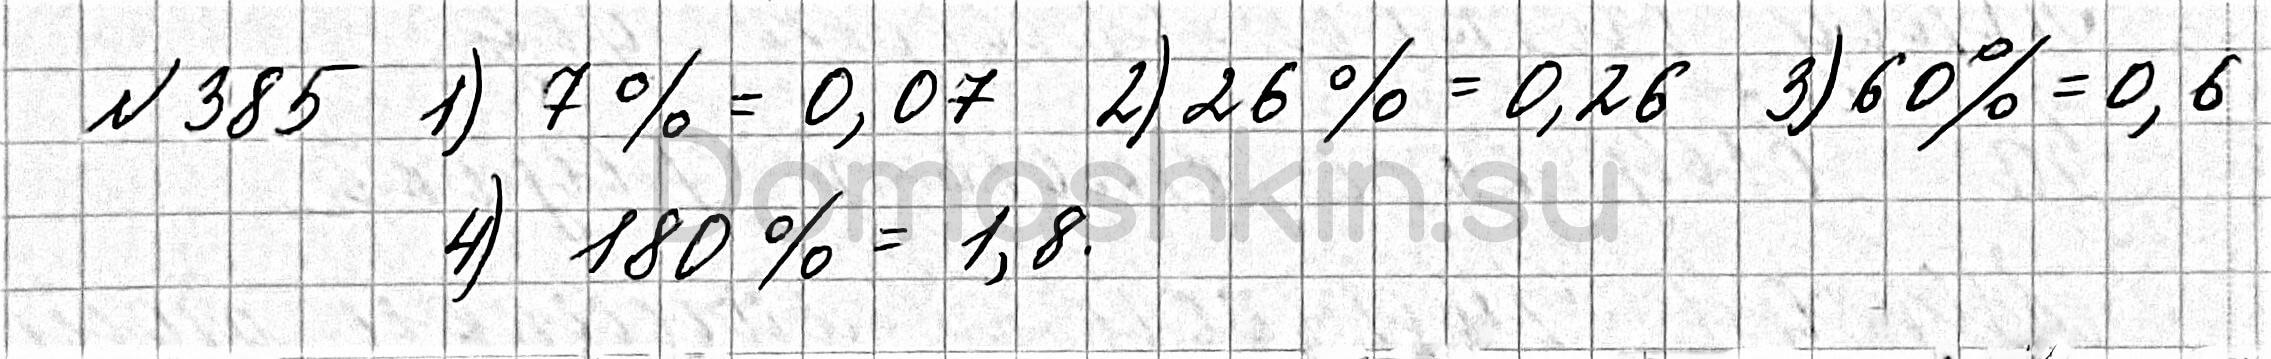 Математика 6 класс учебник Мерзляк номер 385 решение